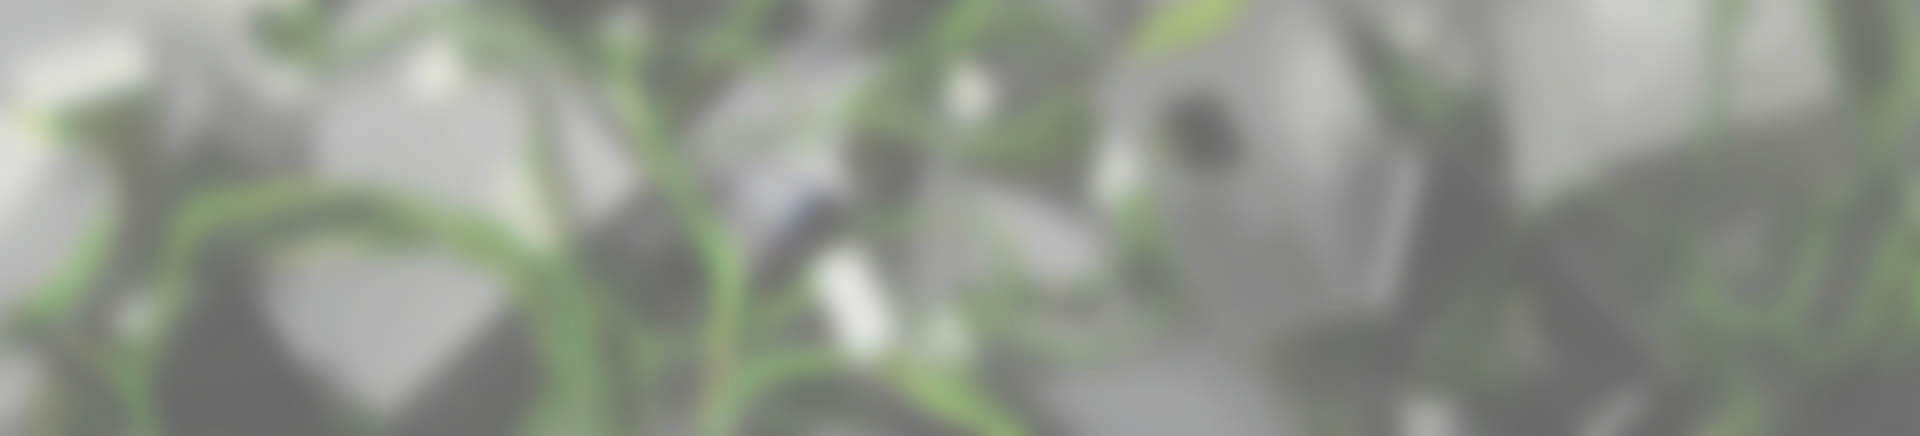 slide-bg1_blur